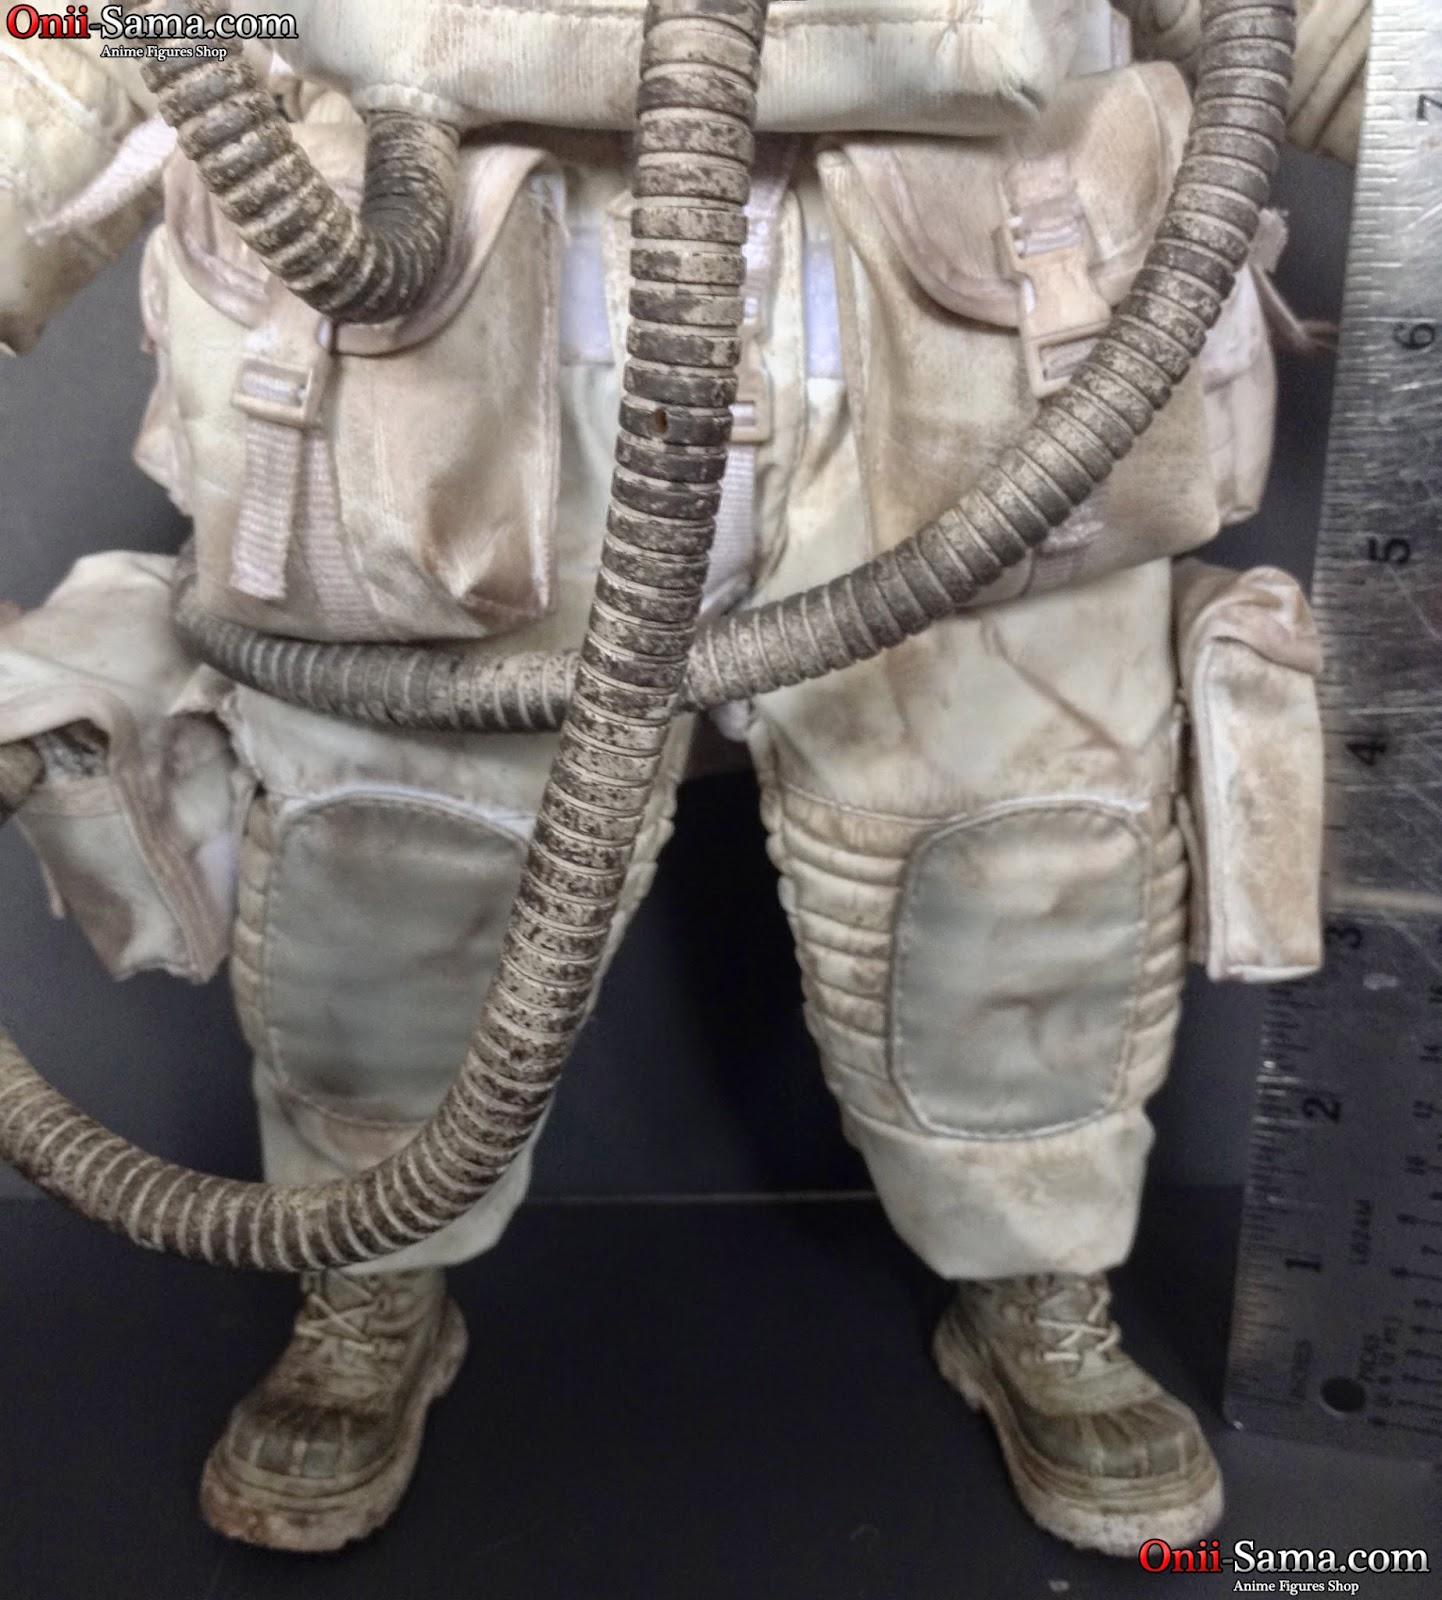 astronaut statue spokane - photo #22